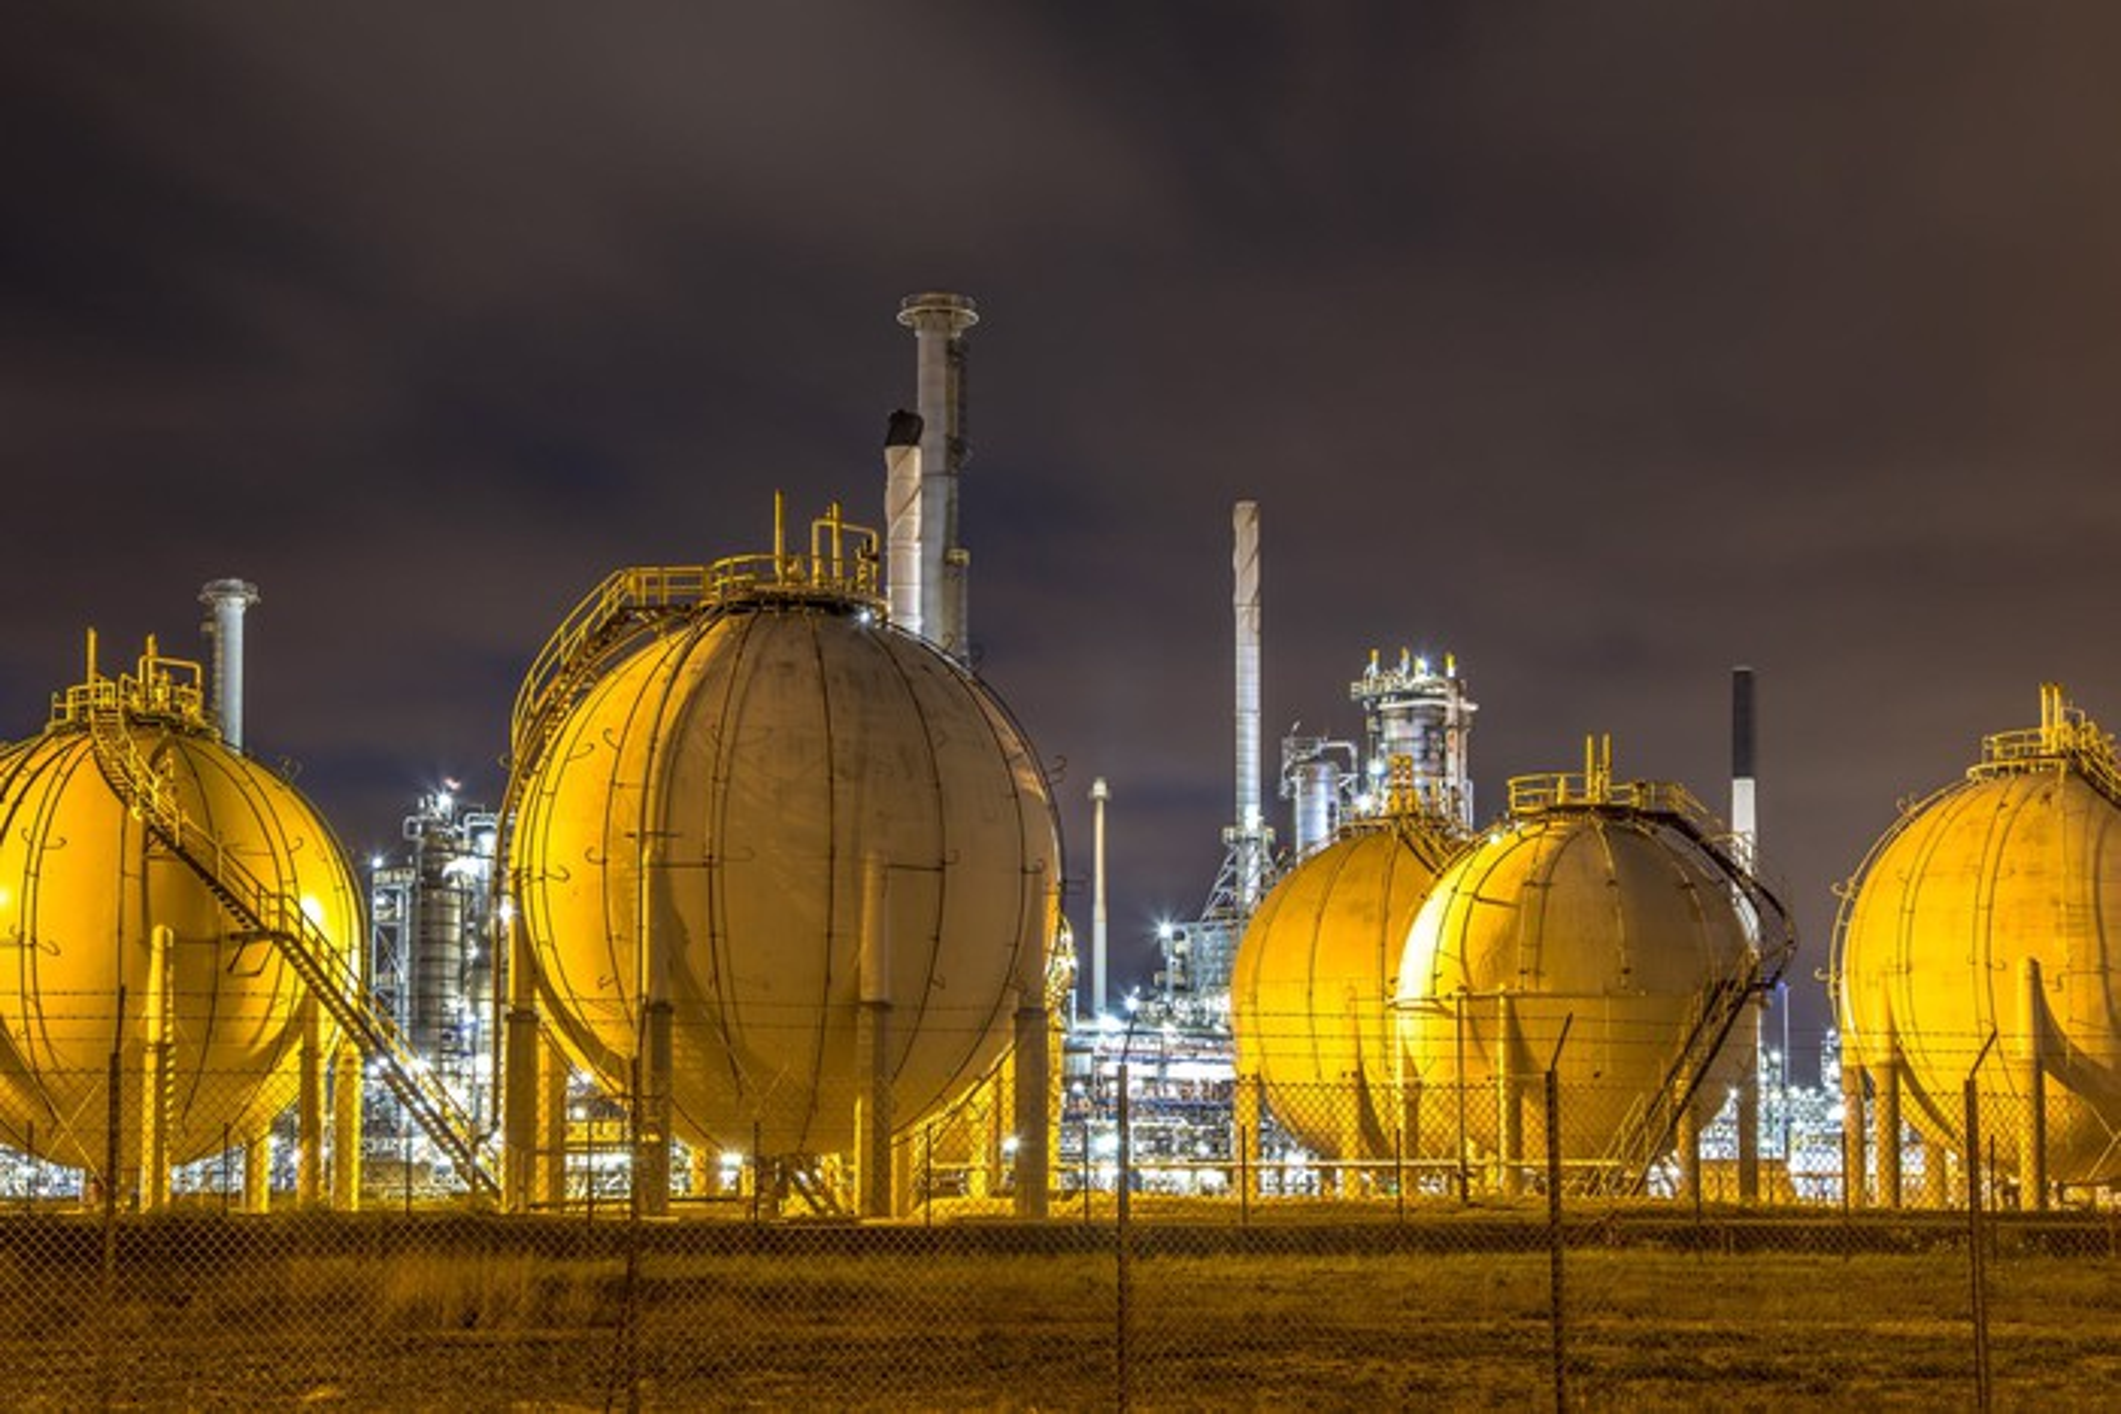 An LNG plant.